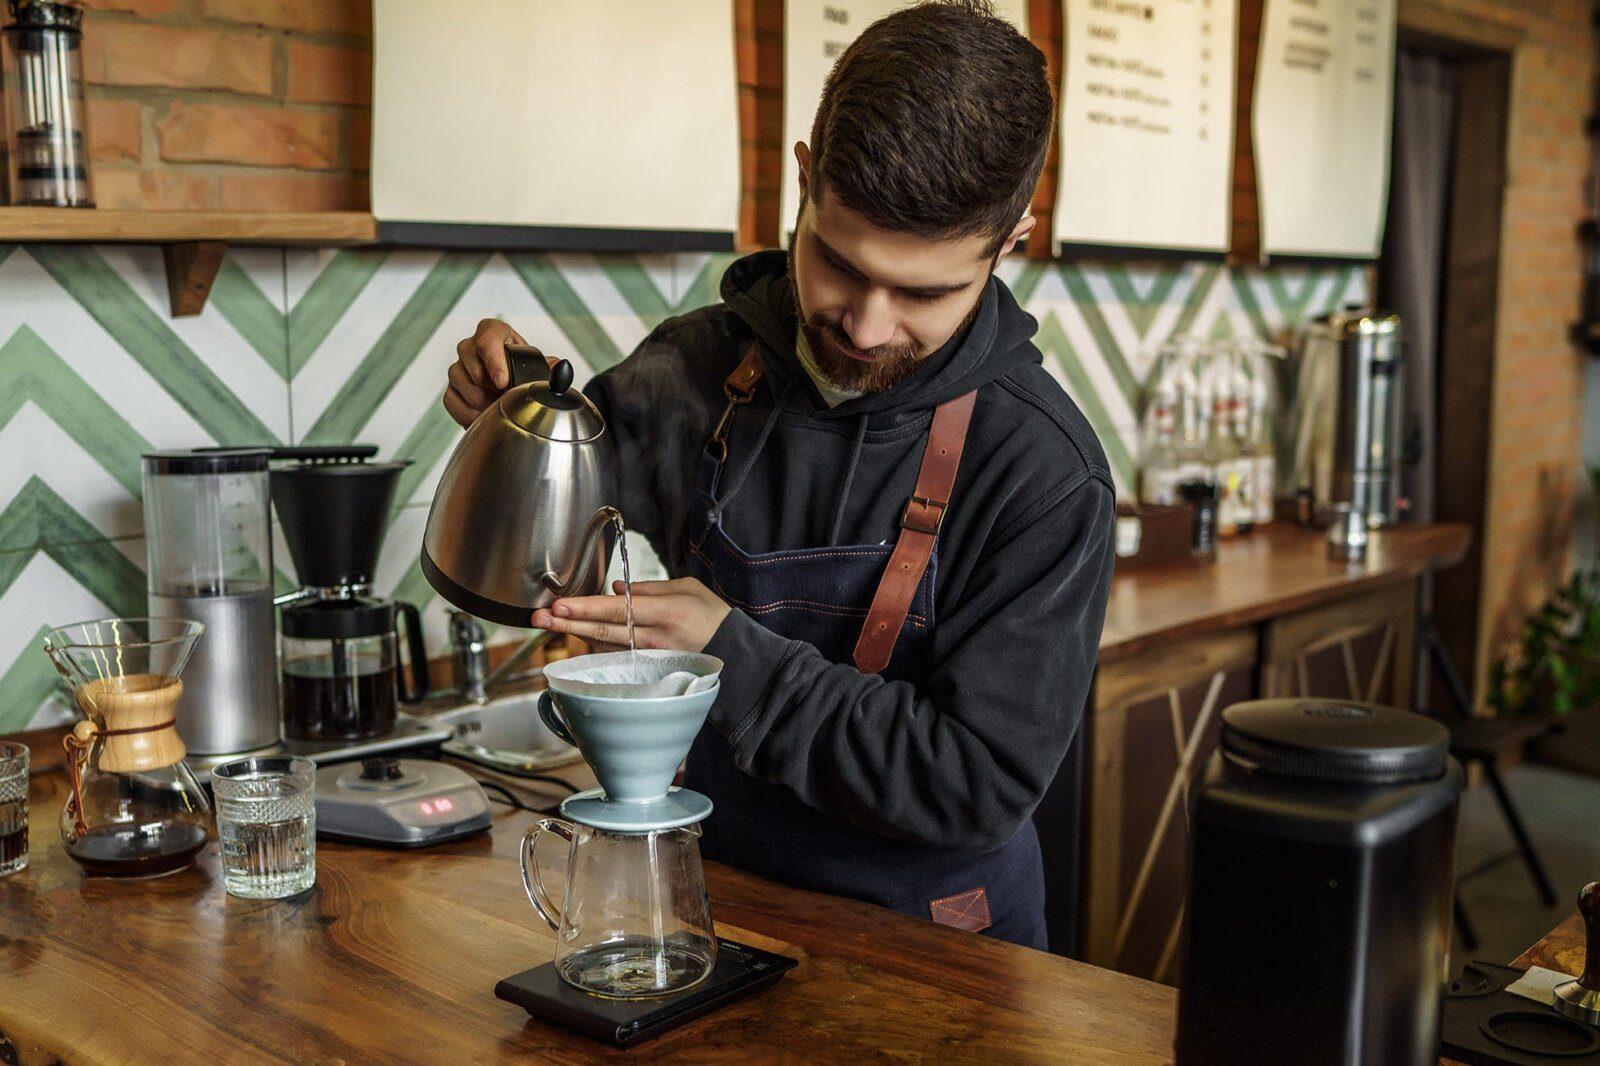 Barista in a coffee shop